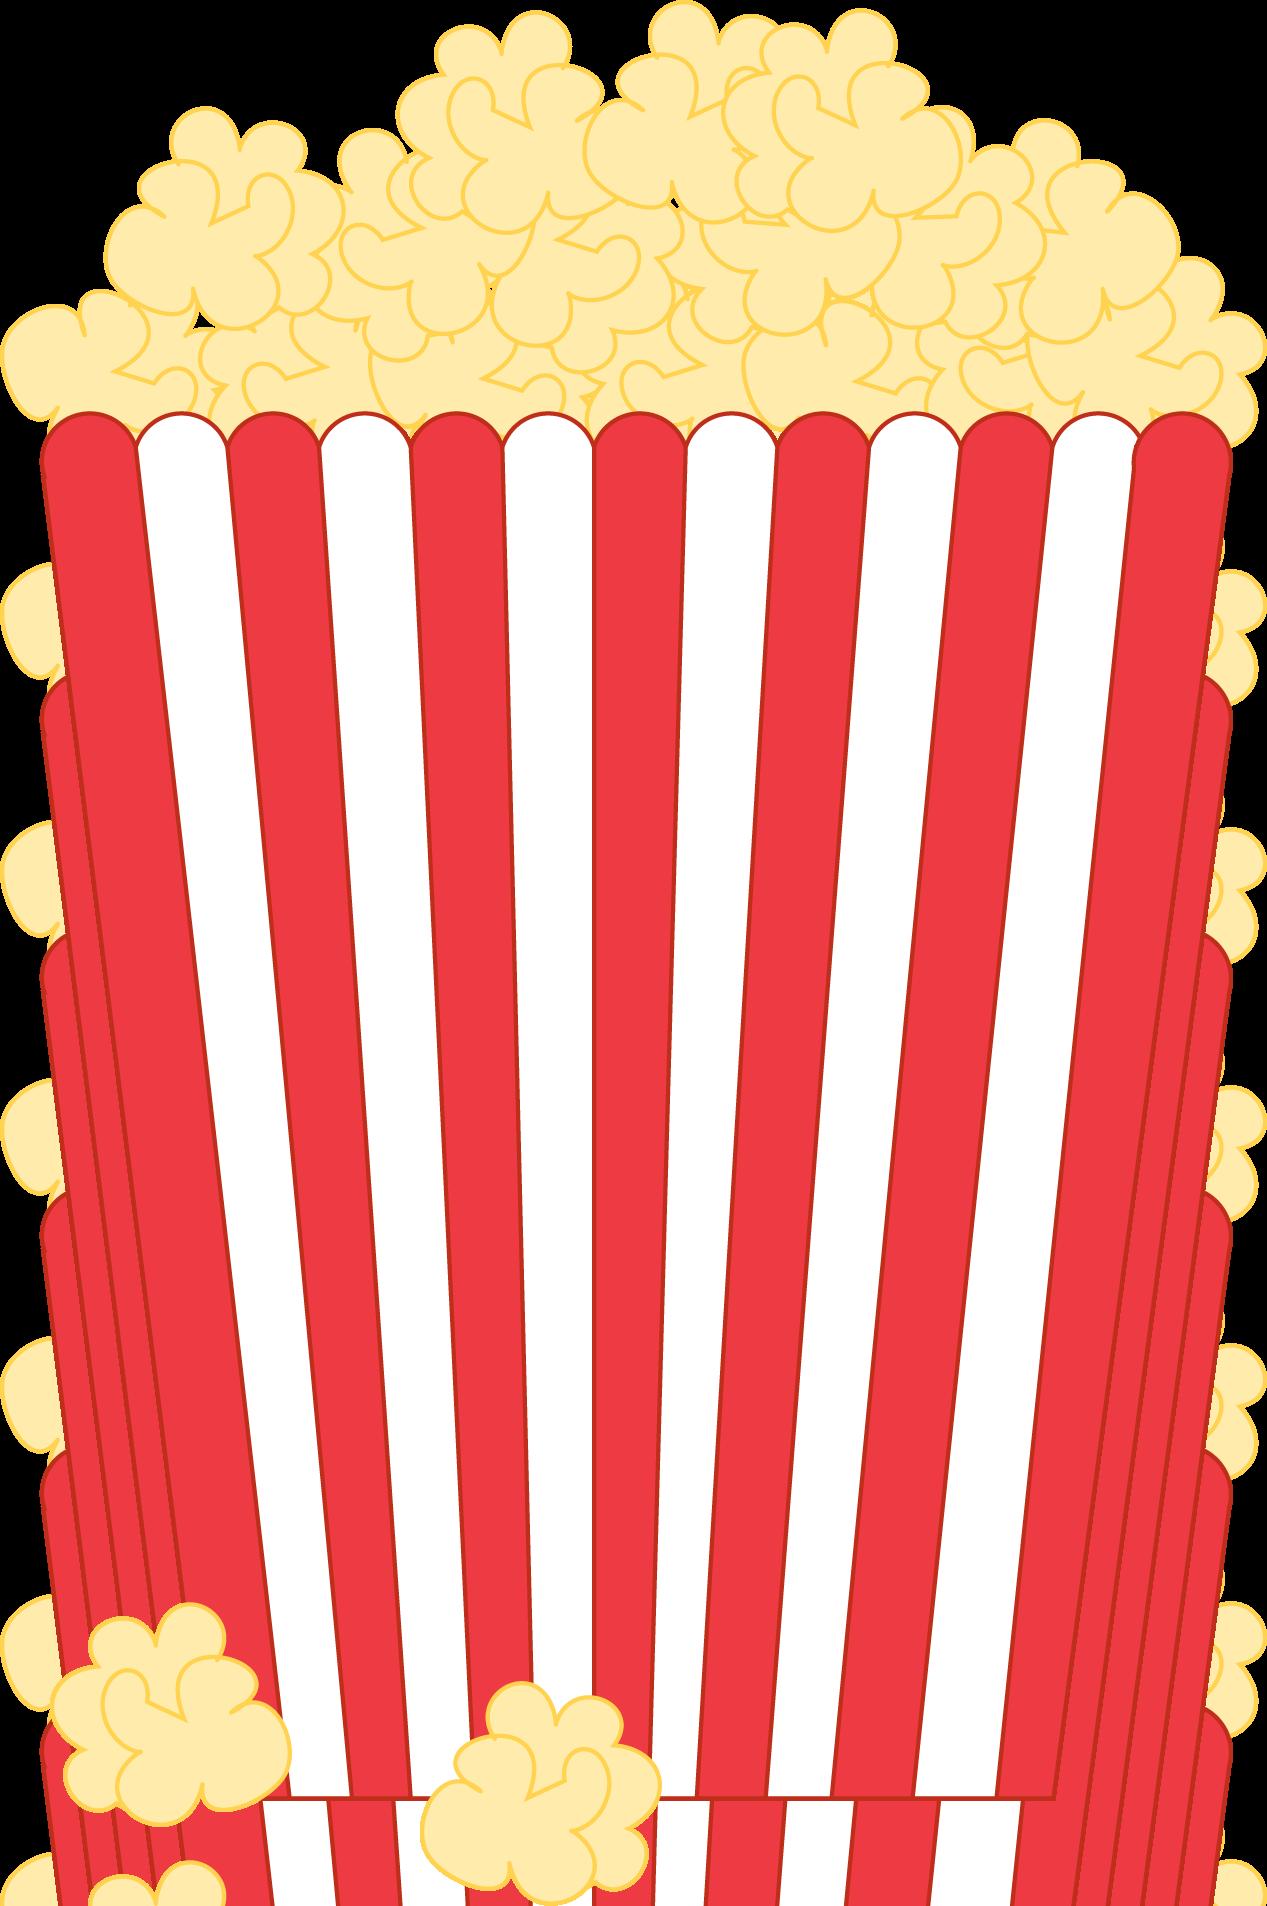 popcorn clipart 2